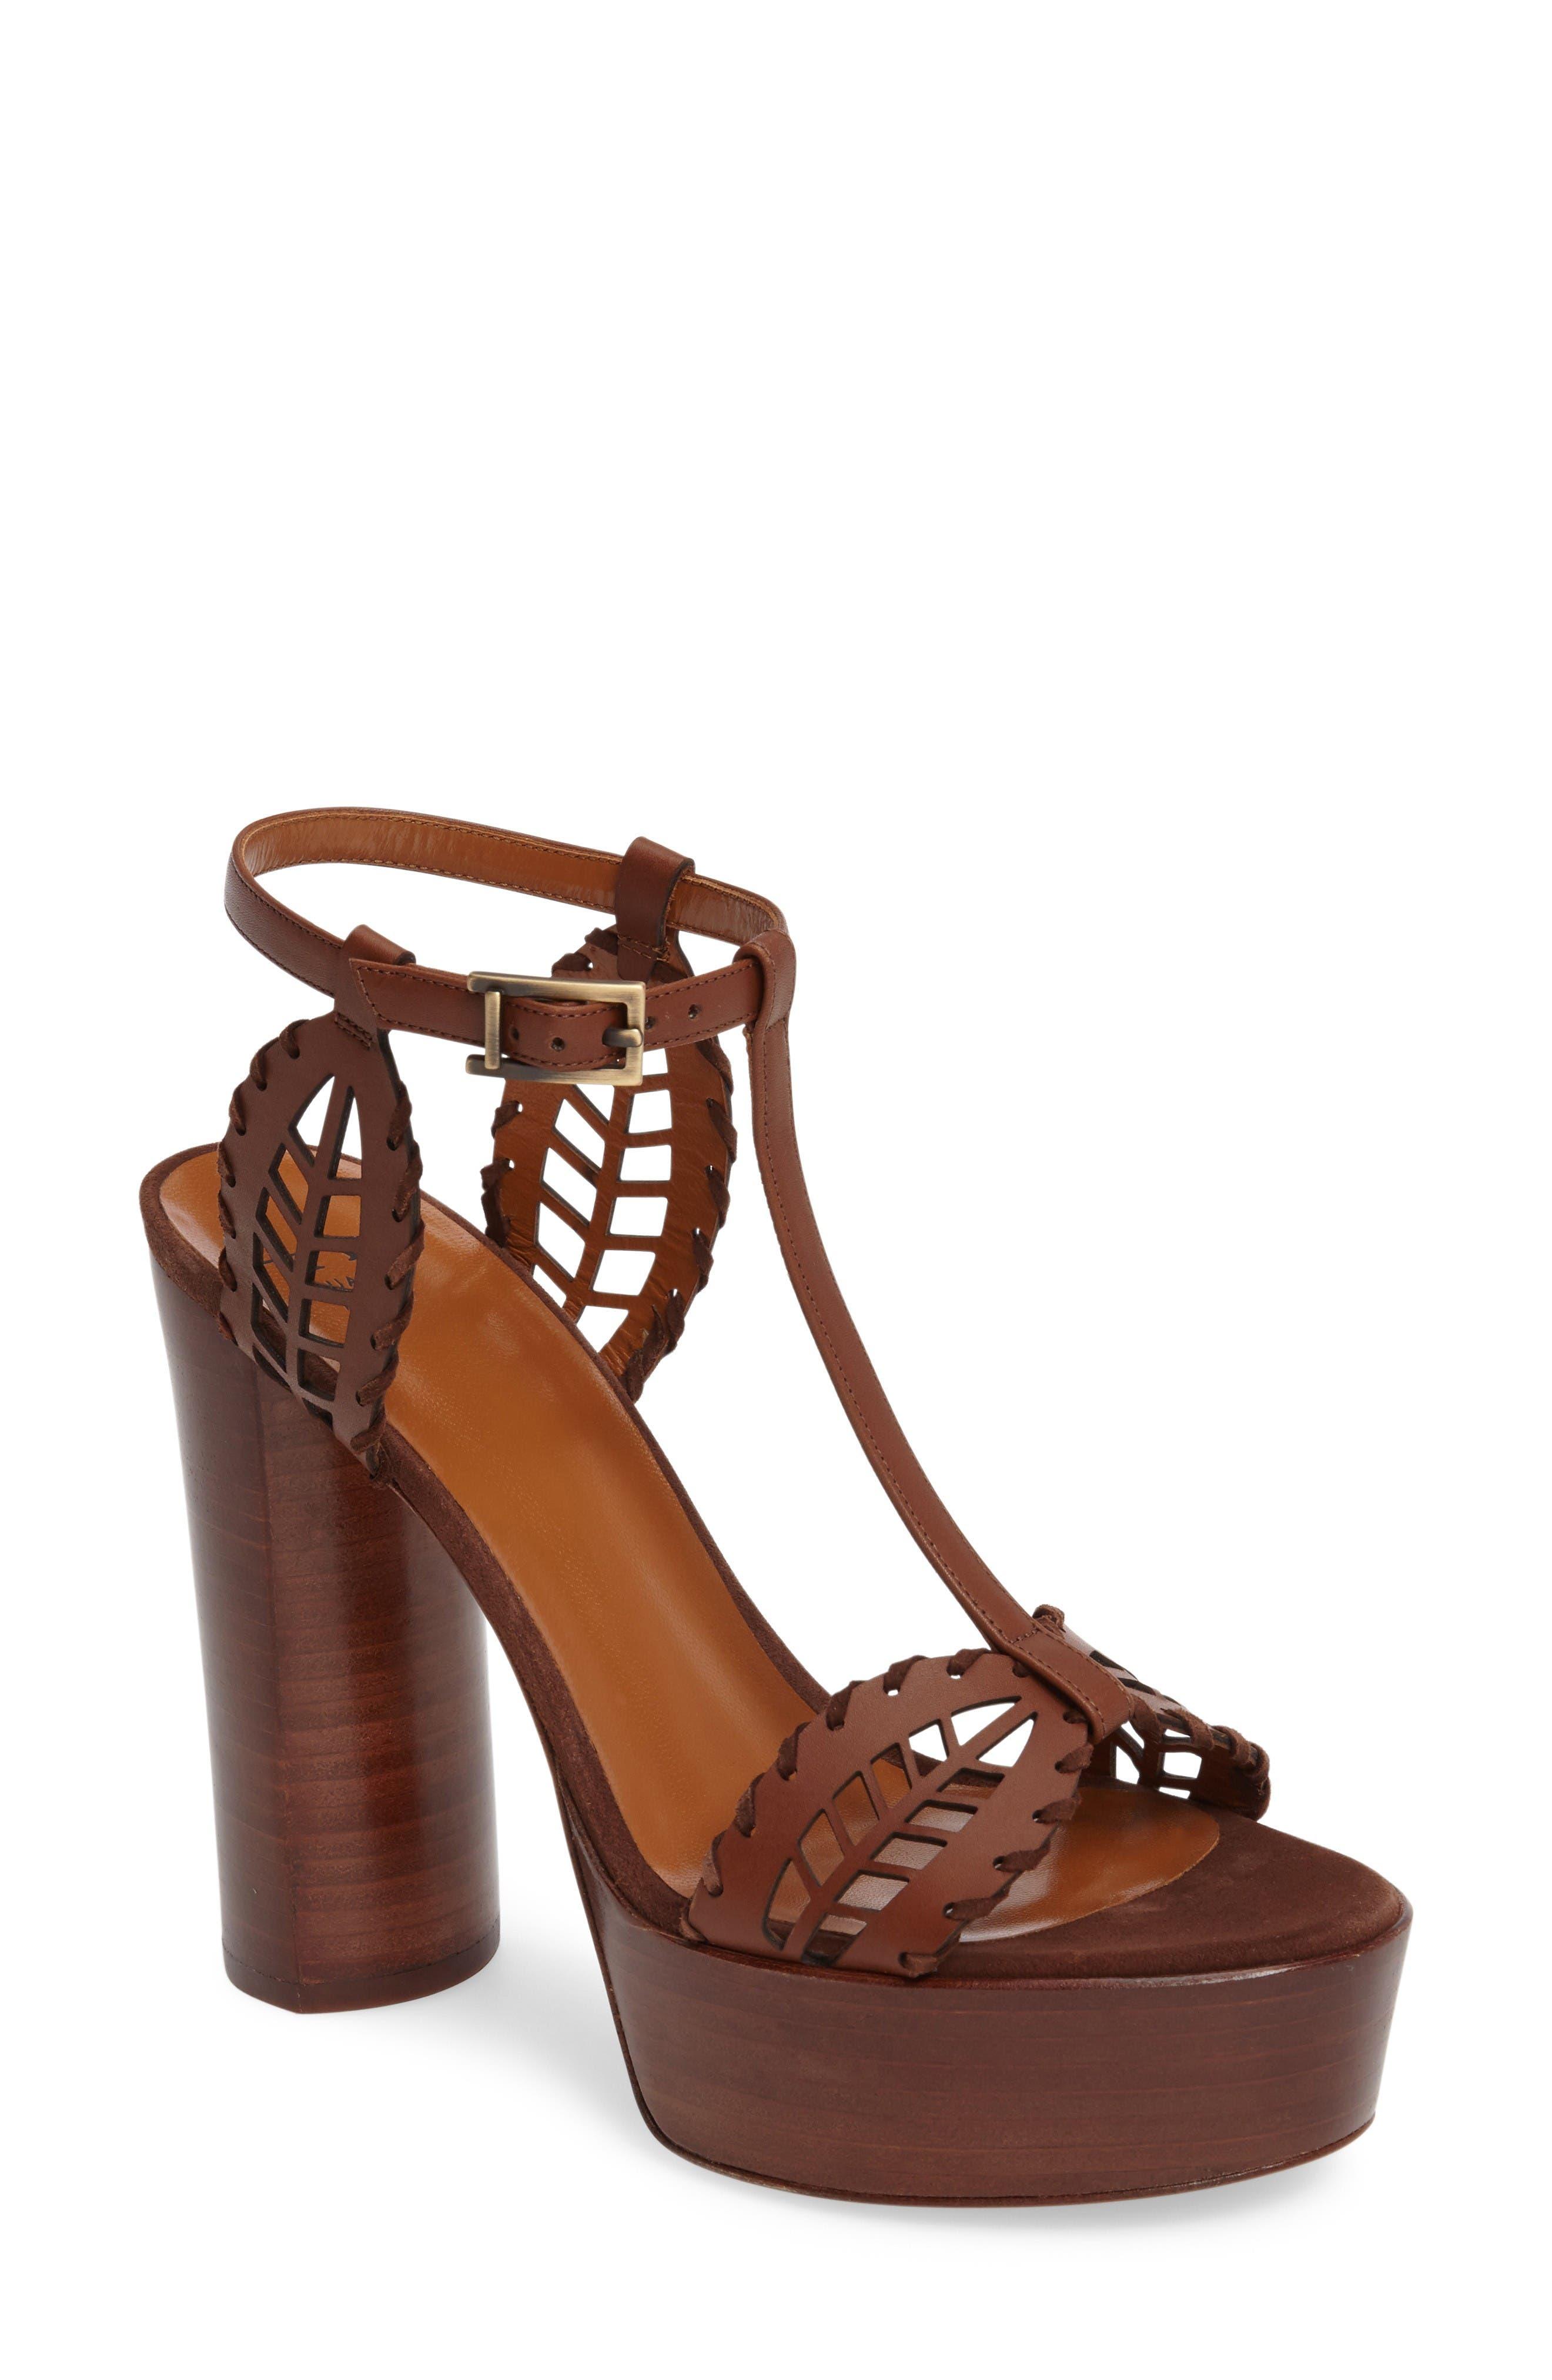 Alternate Image 1 Selected - Aquatalia Isadora T-Strap Platform Sandal (Women)